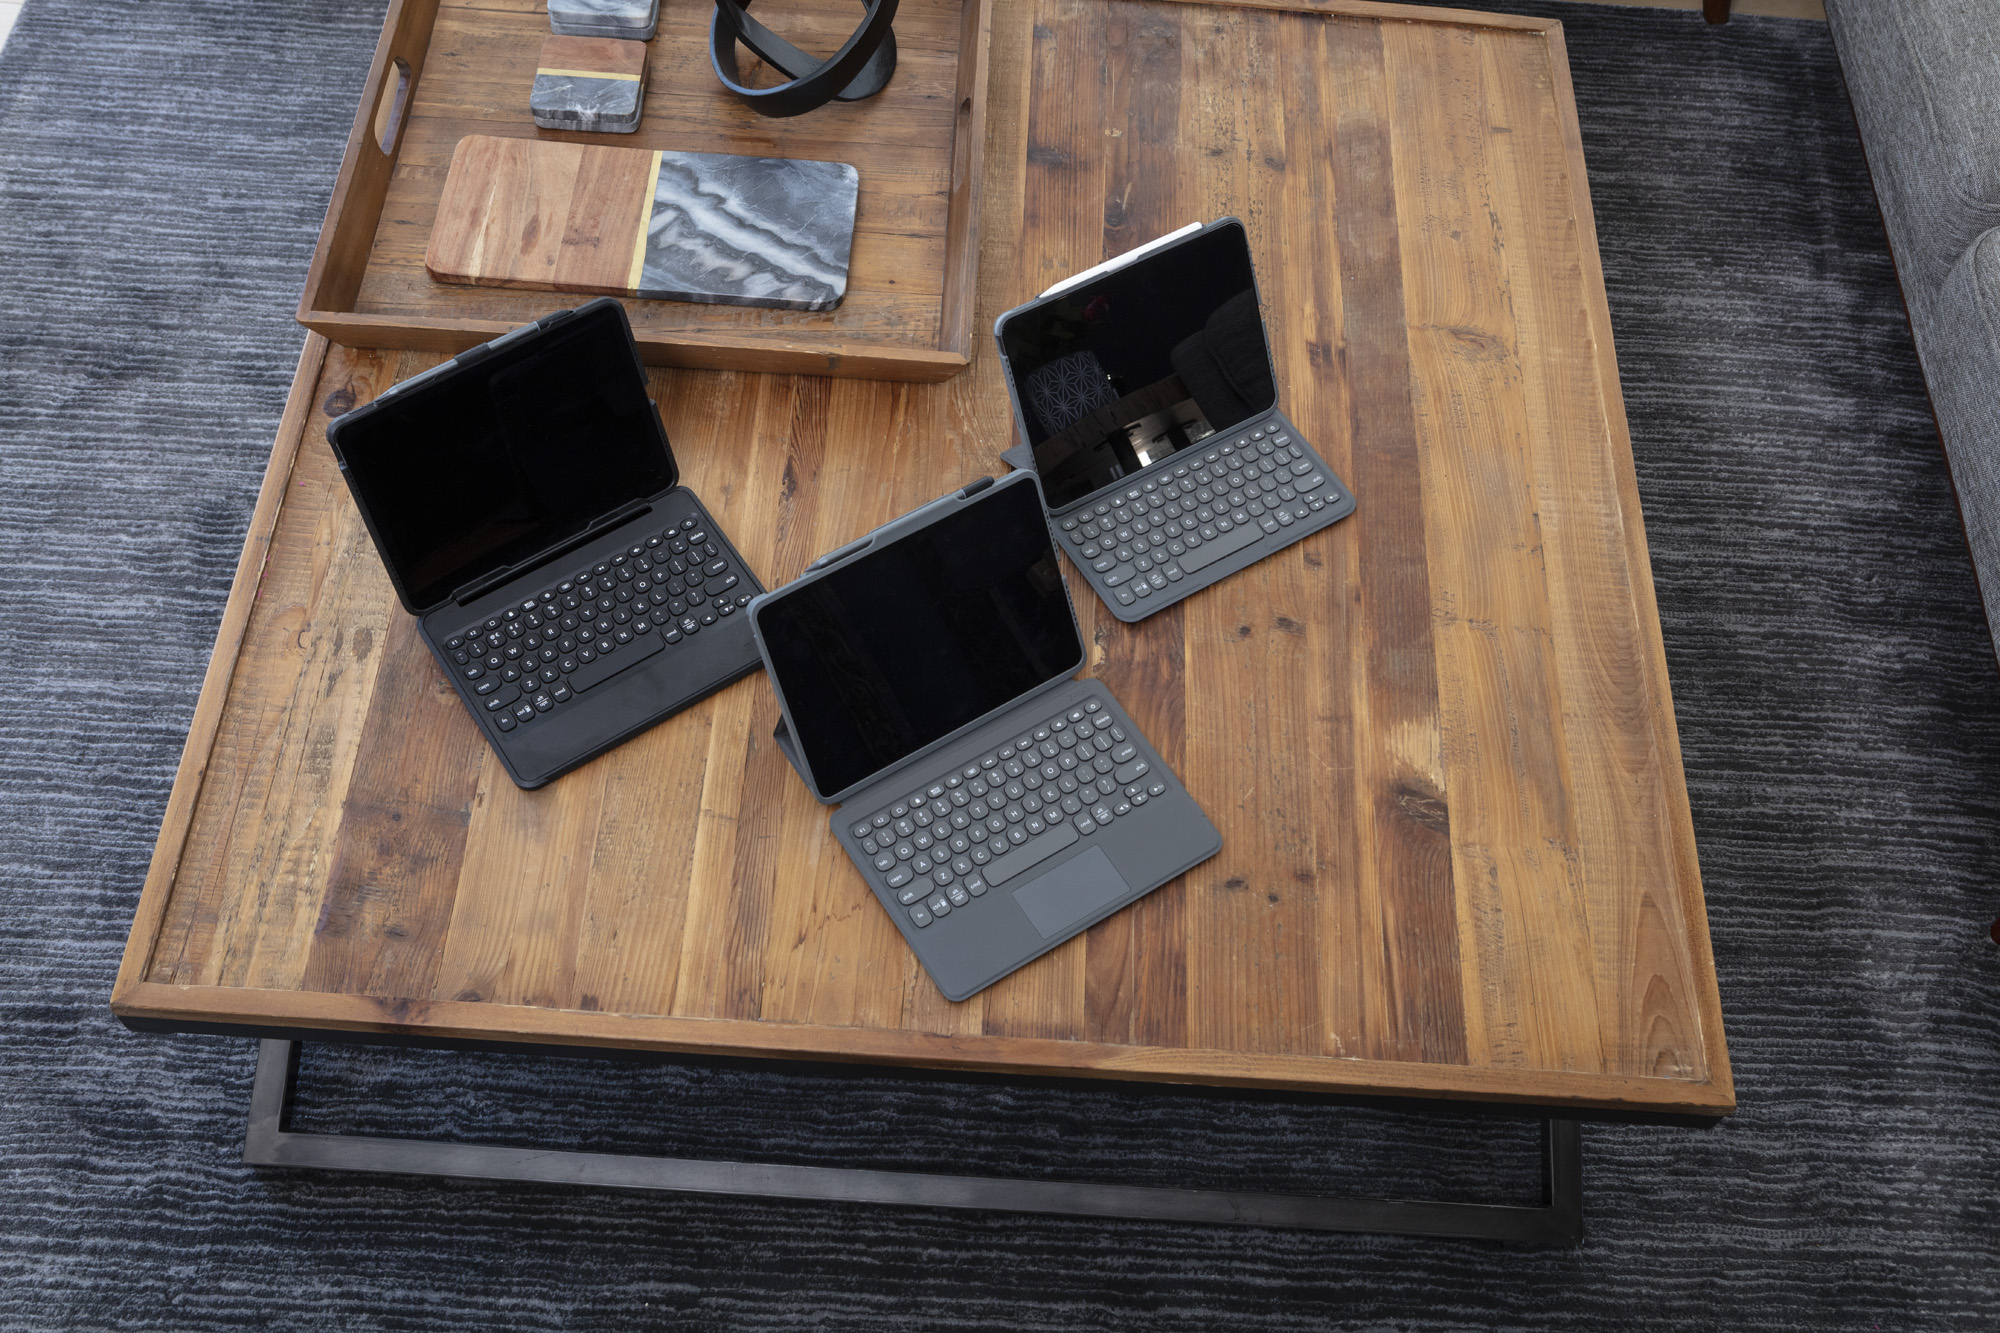 Zagg Pro Keys with Trackpad, Pro Keys, and Rugged Book